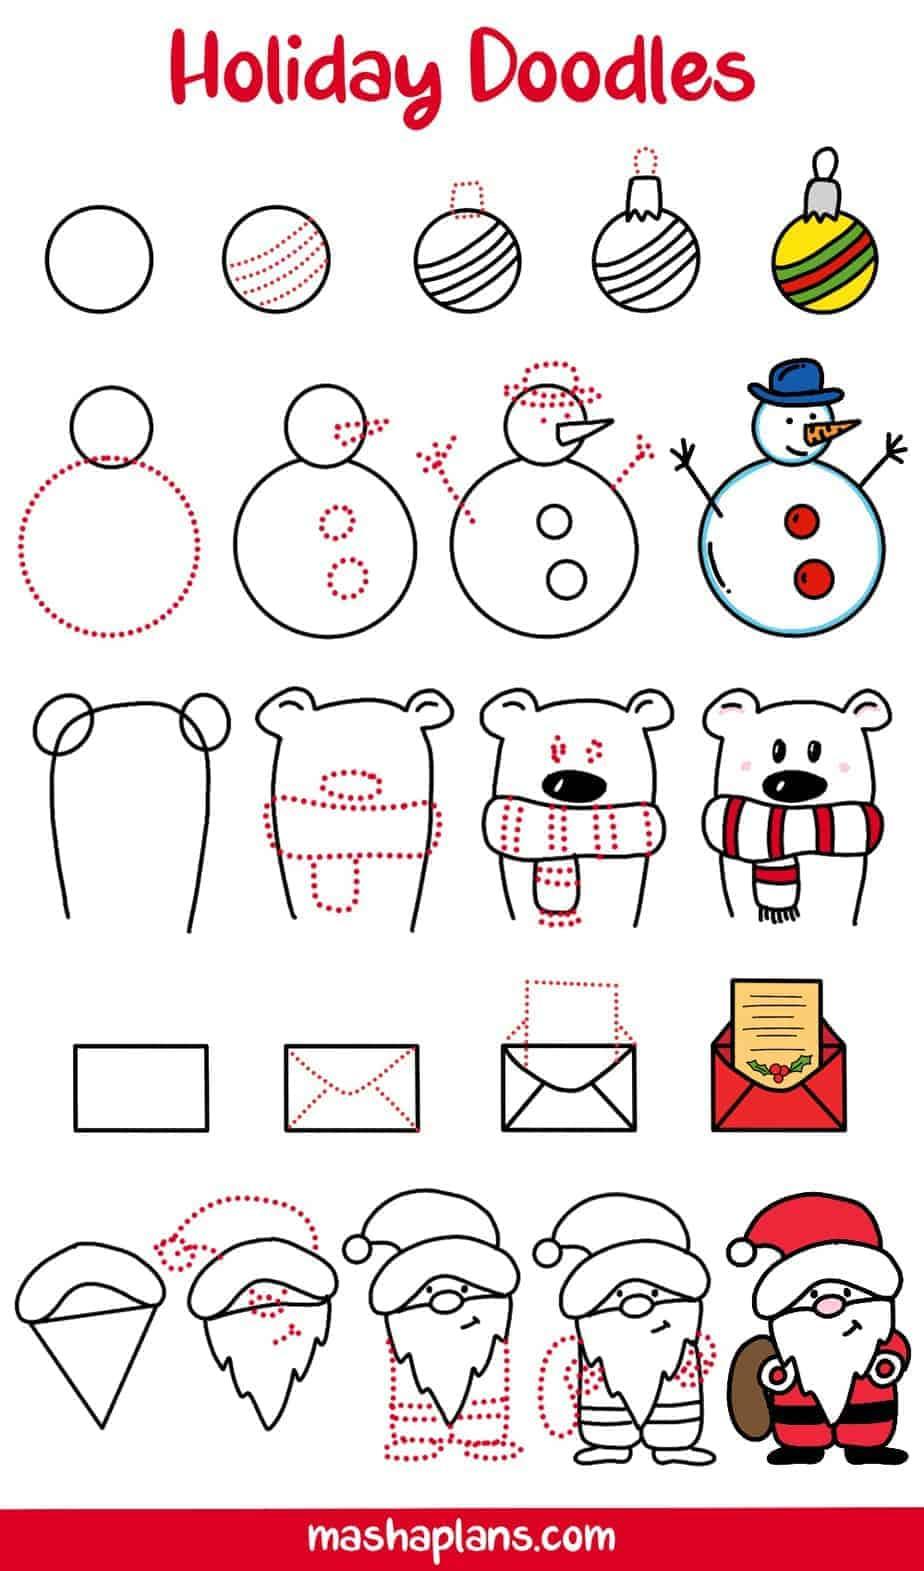 31+ Christmas Doodles For Your Bullet Journal | Masha Plans